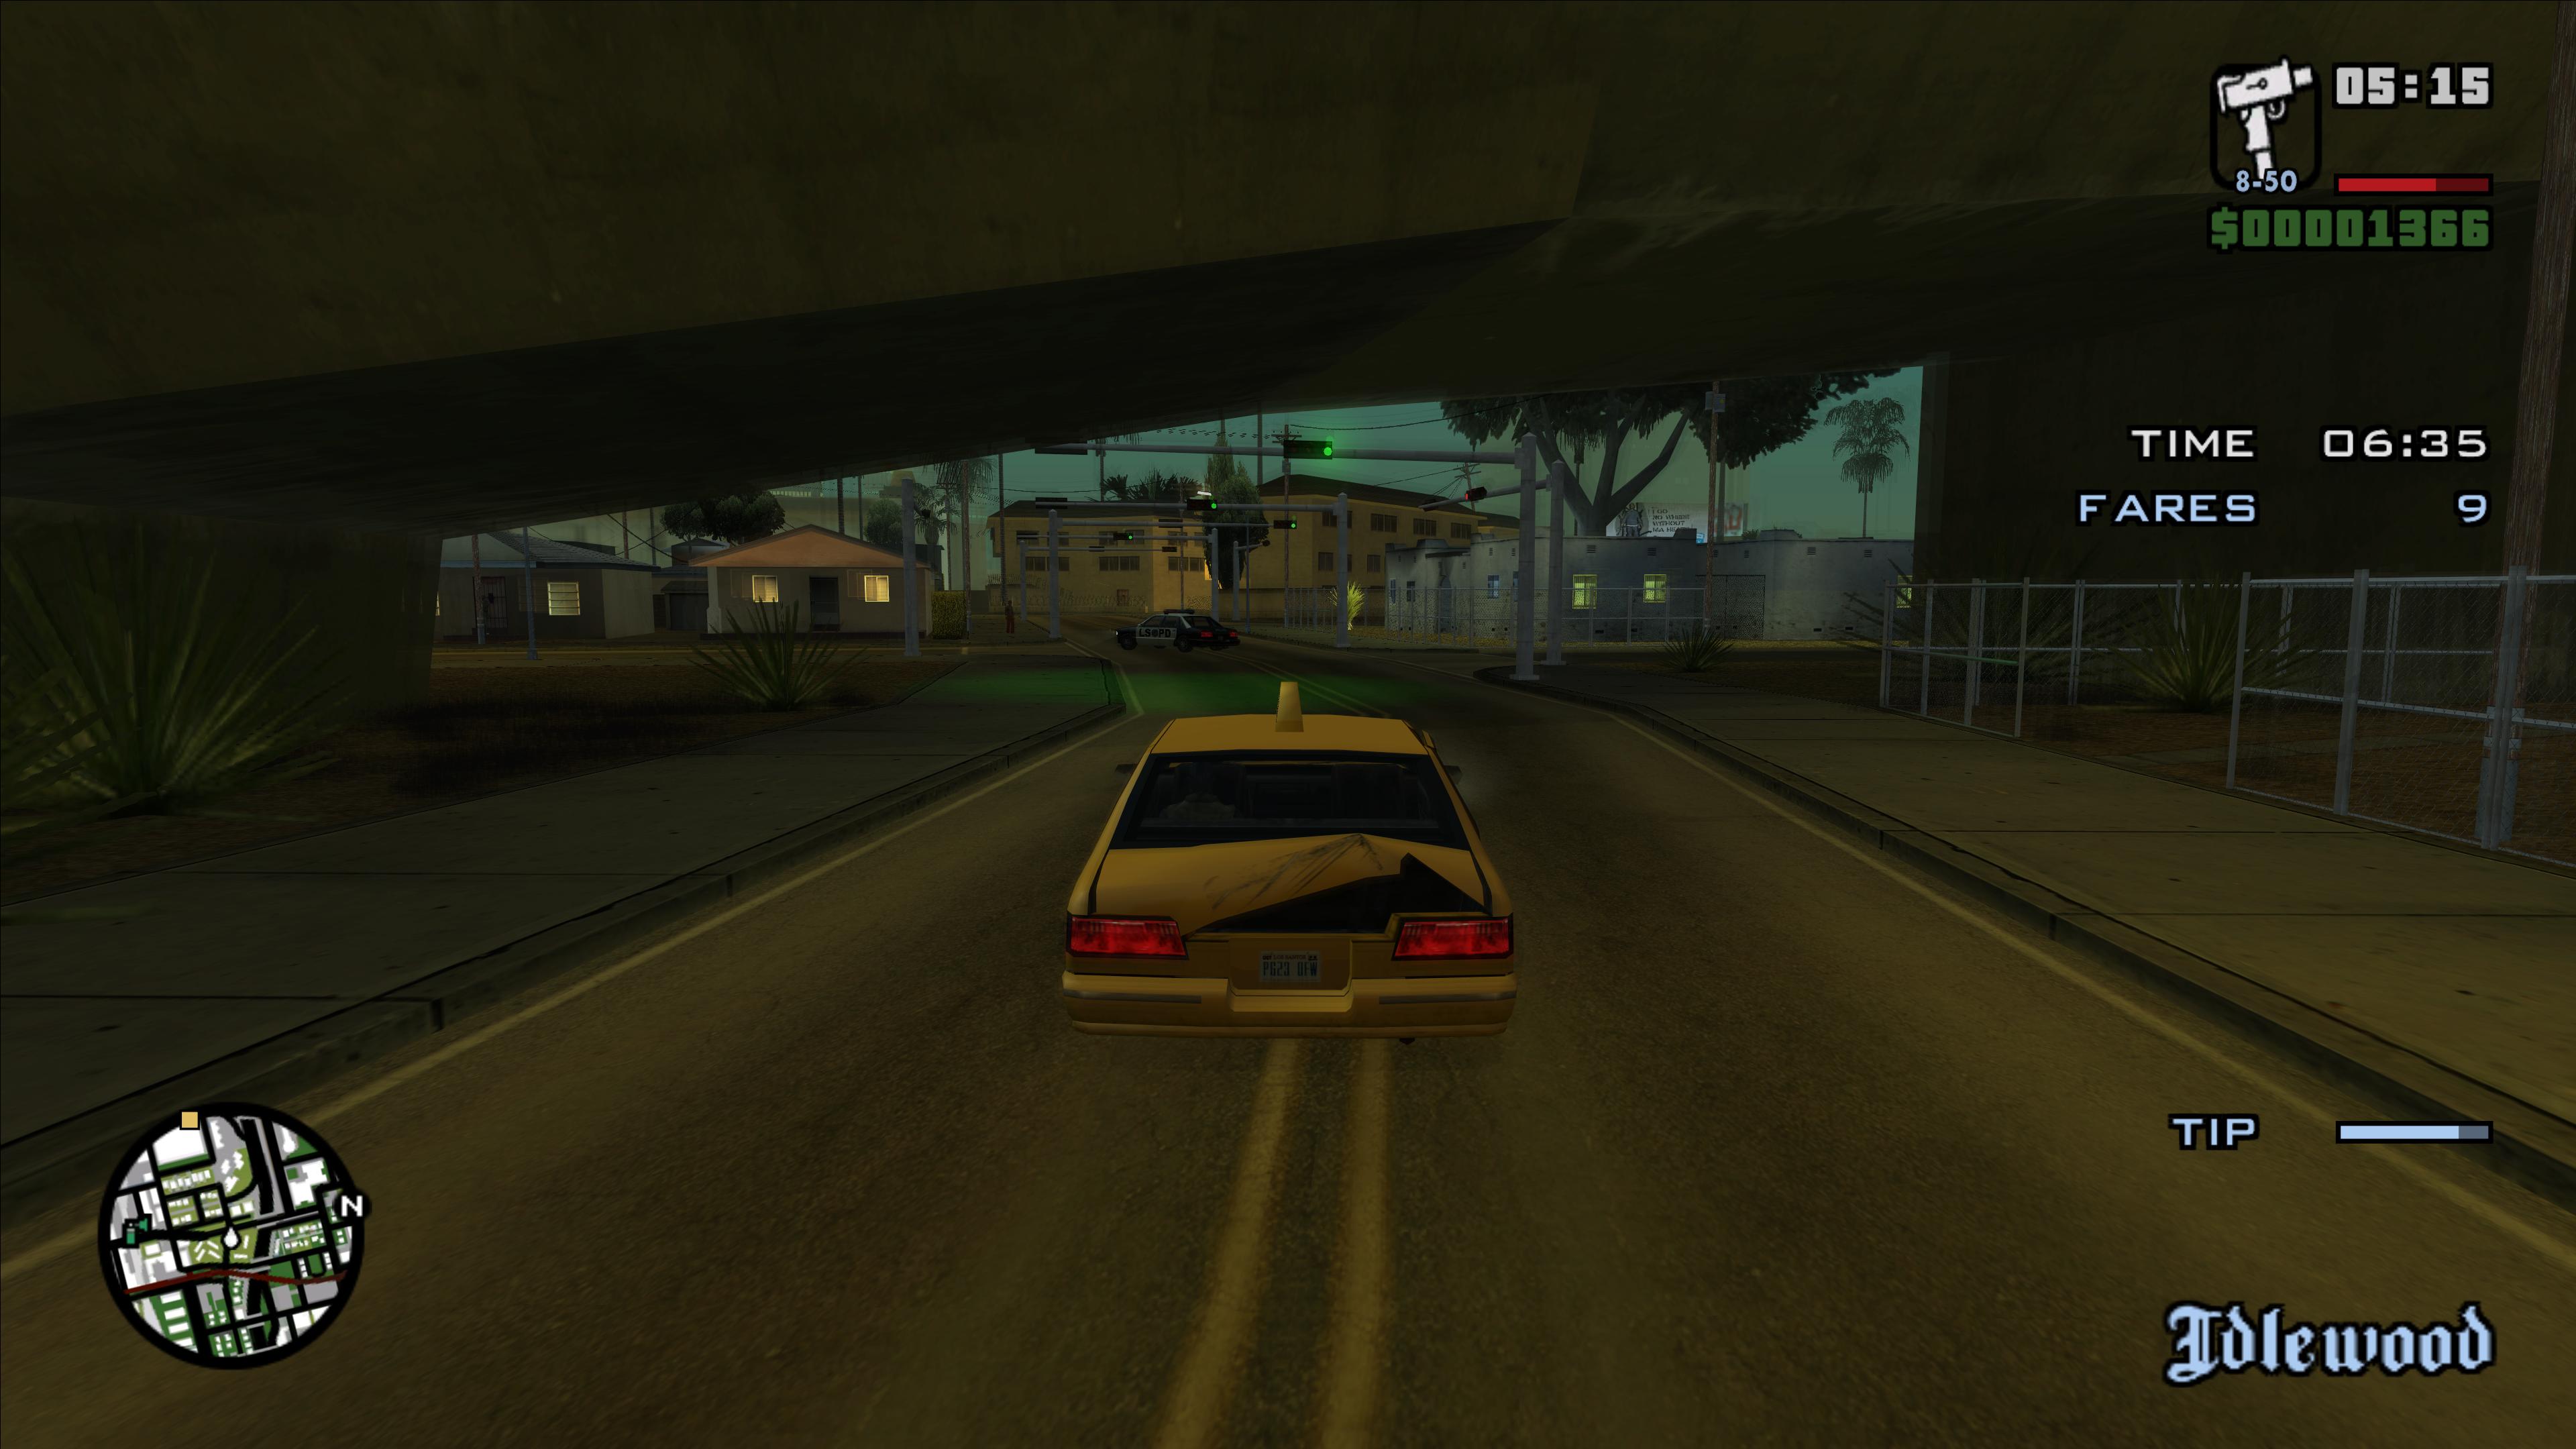 Grand-Theft-Auto-San-Andreas-Screenshot-2021-06-09-22-10-18-71.png